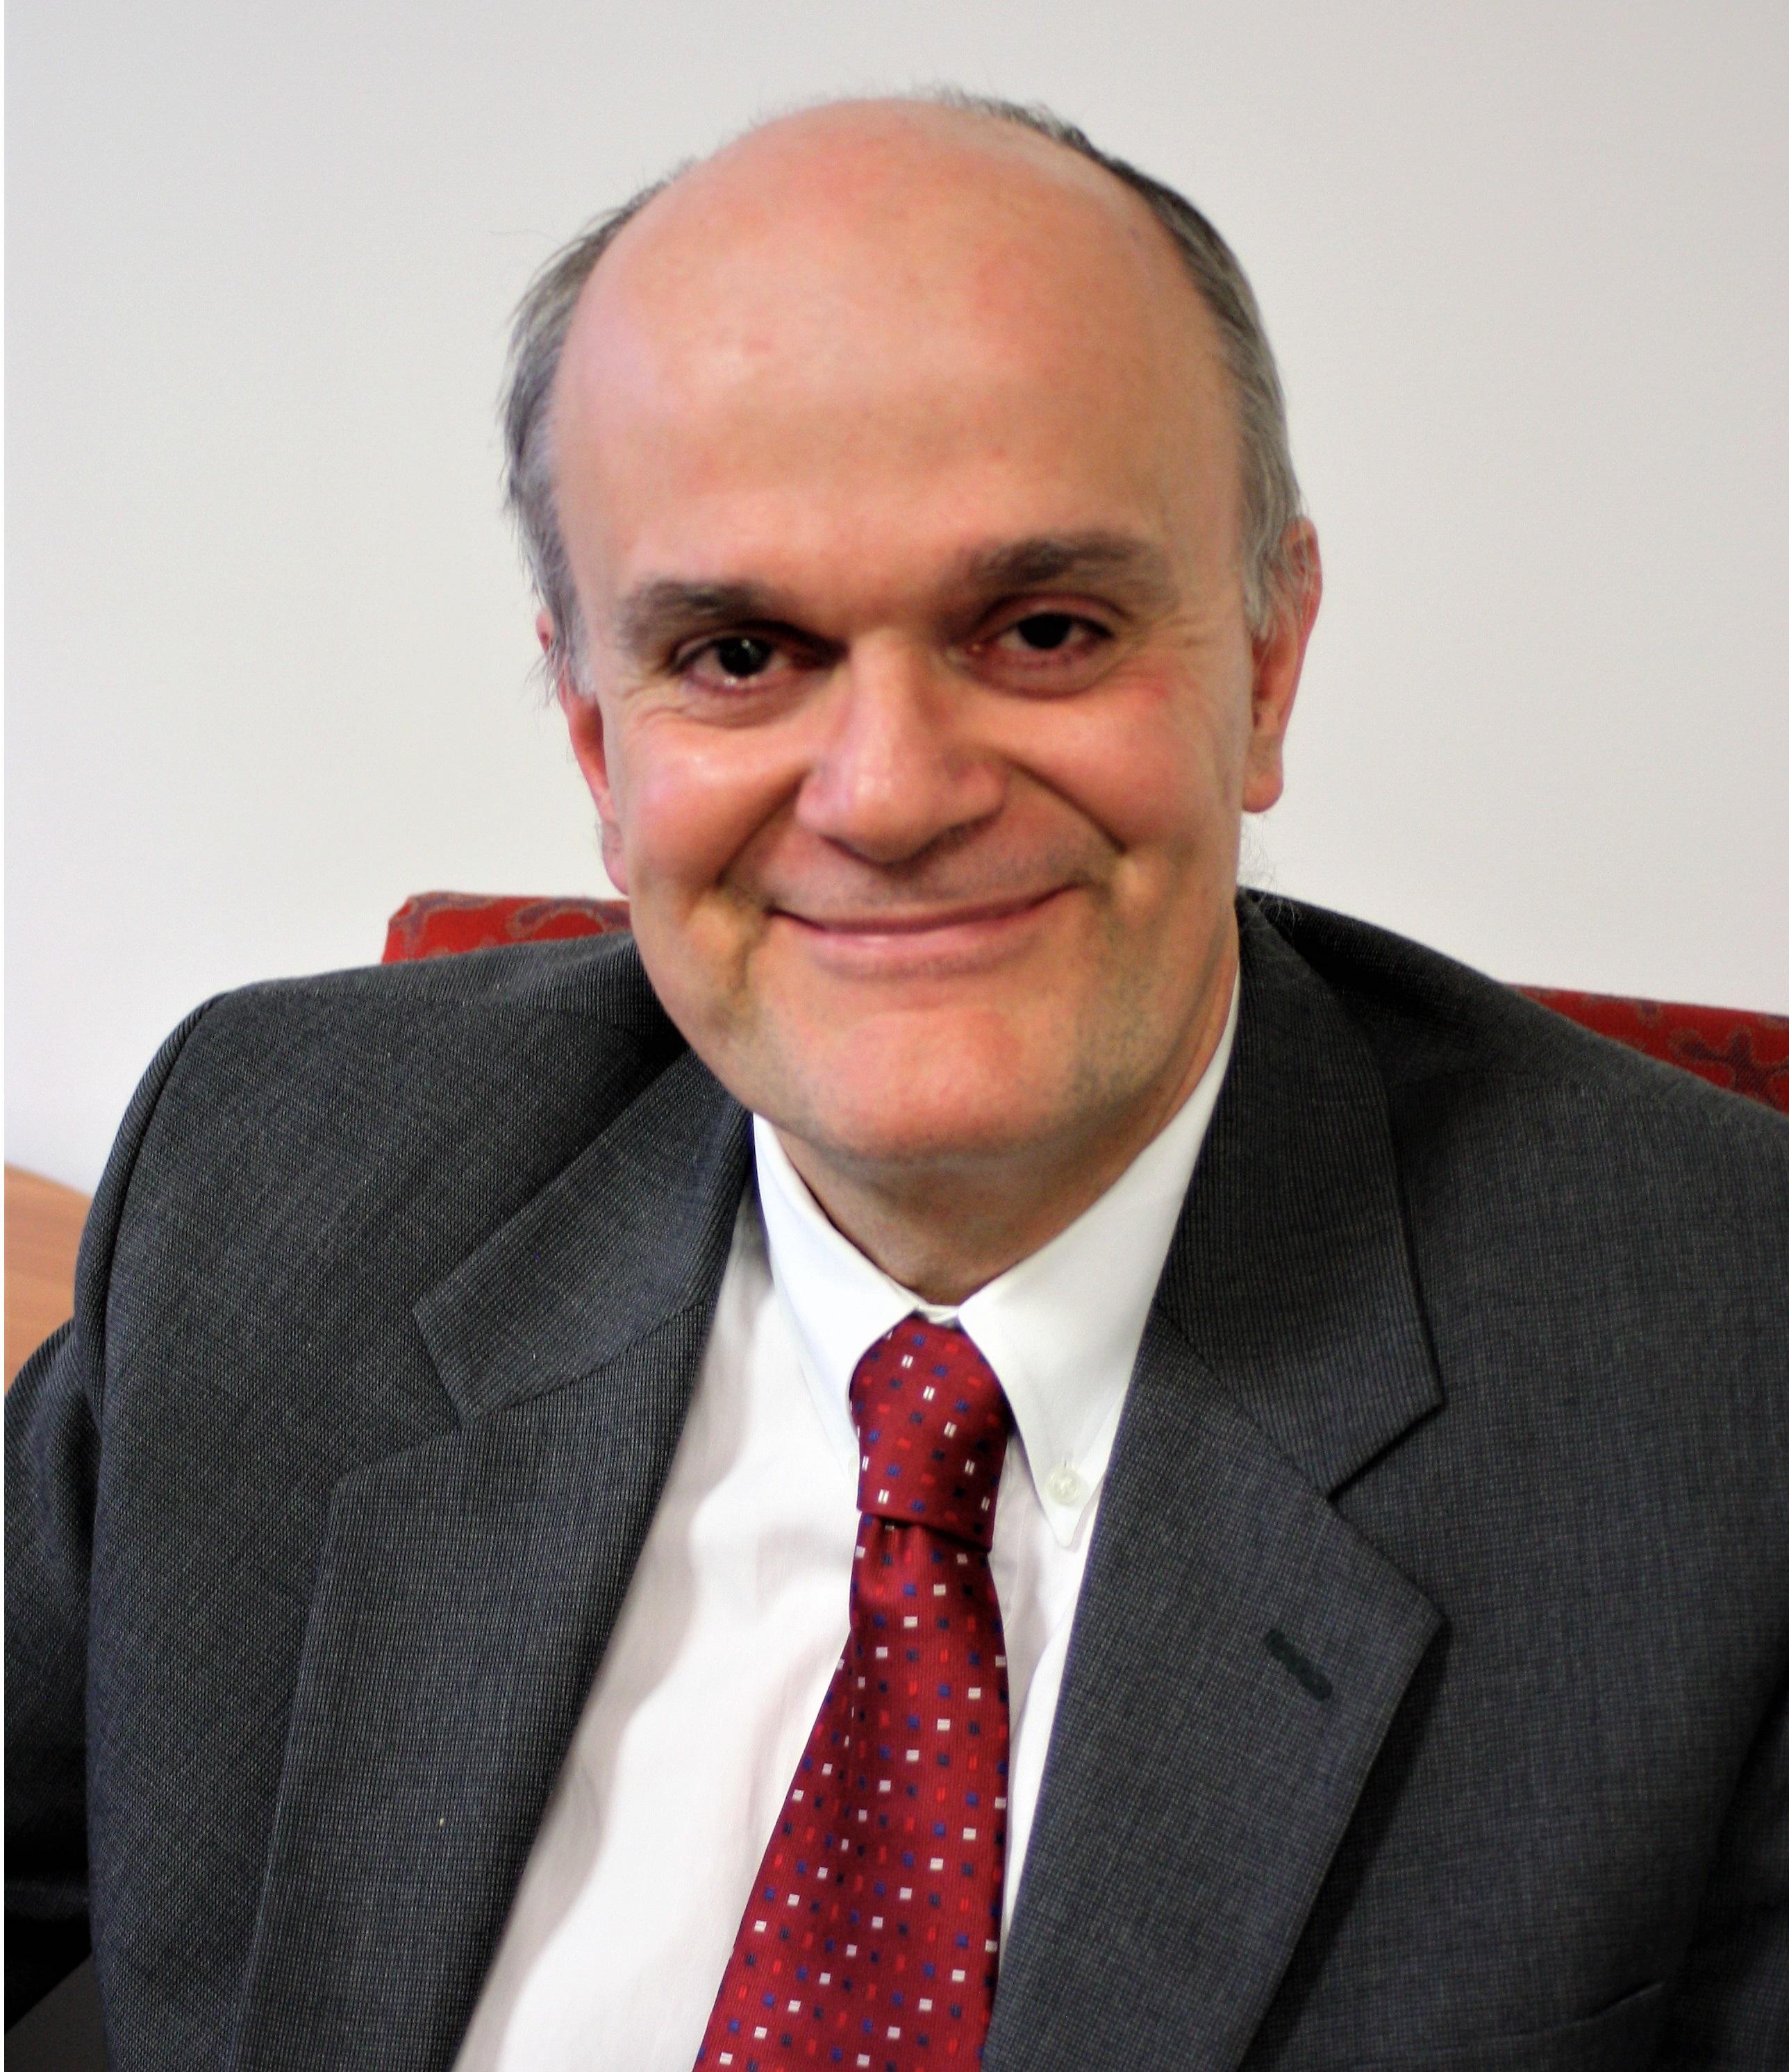 DR. MICHAEL KUZEFF